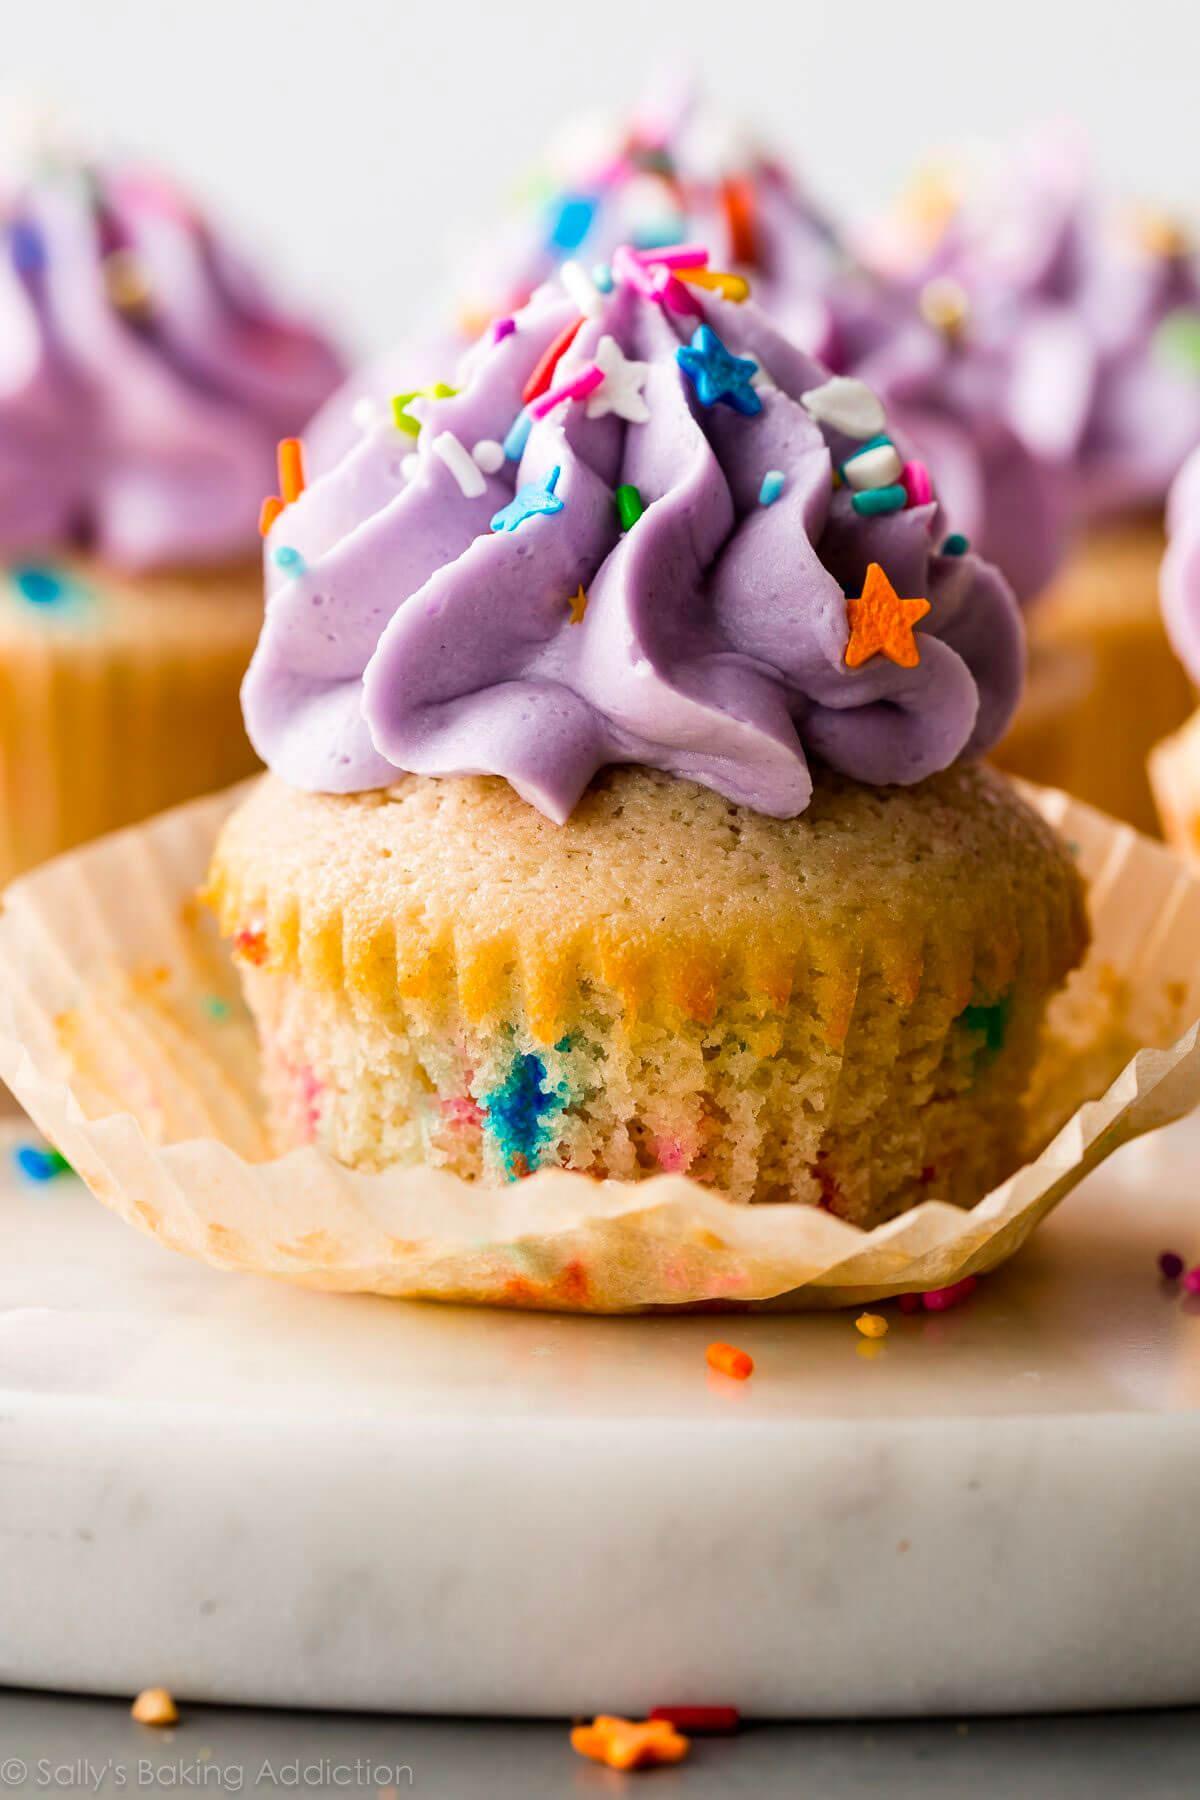 Soft & Fluffy Funfetti Cupcakes